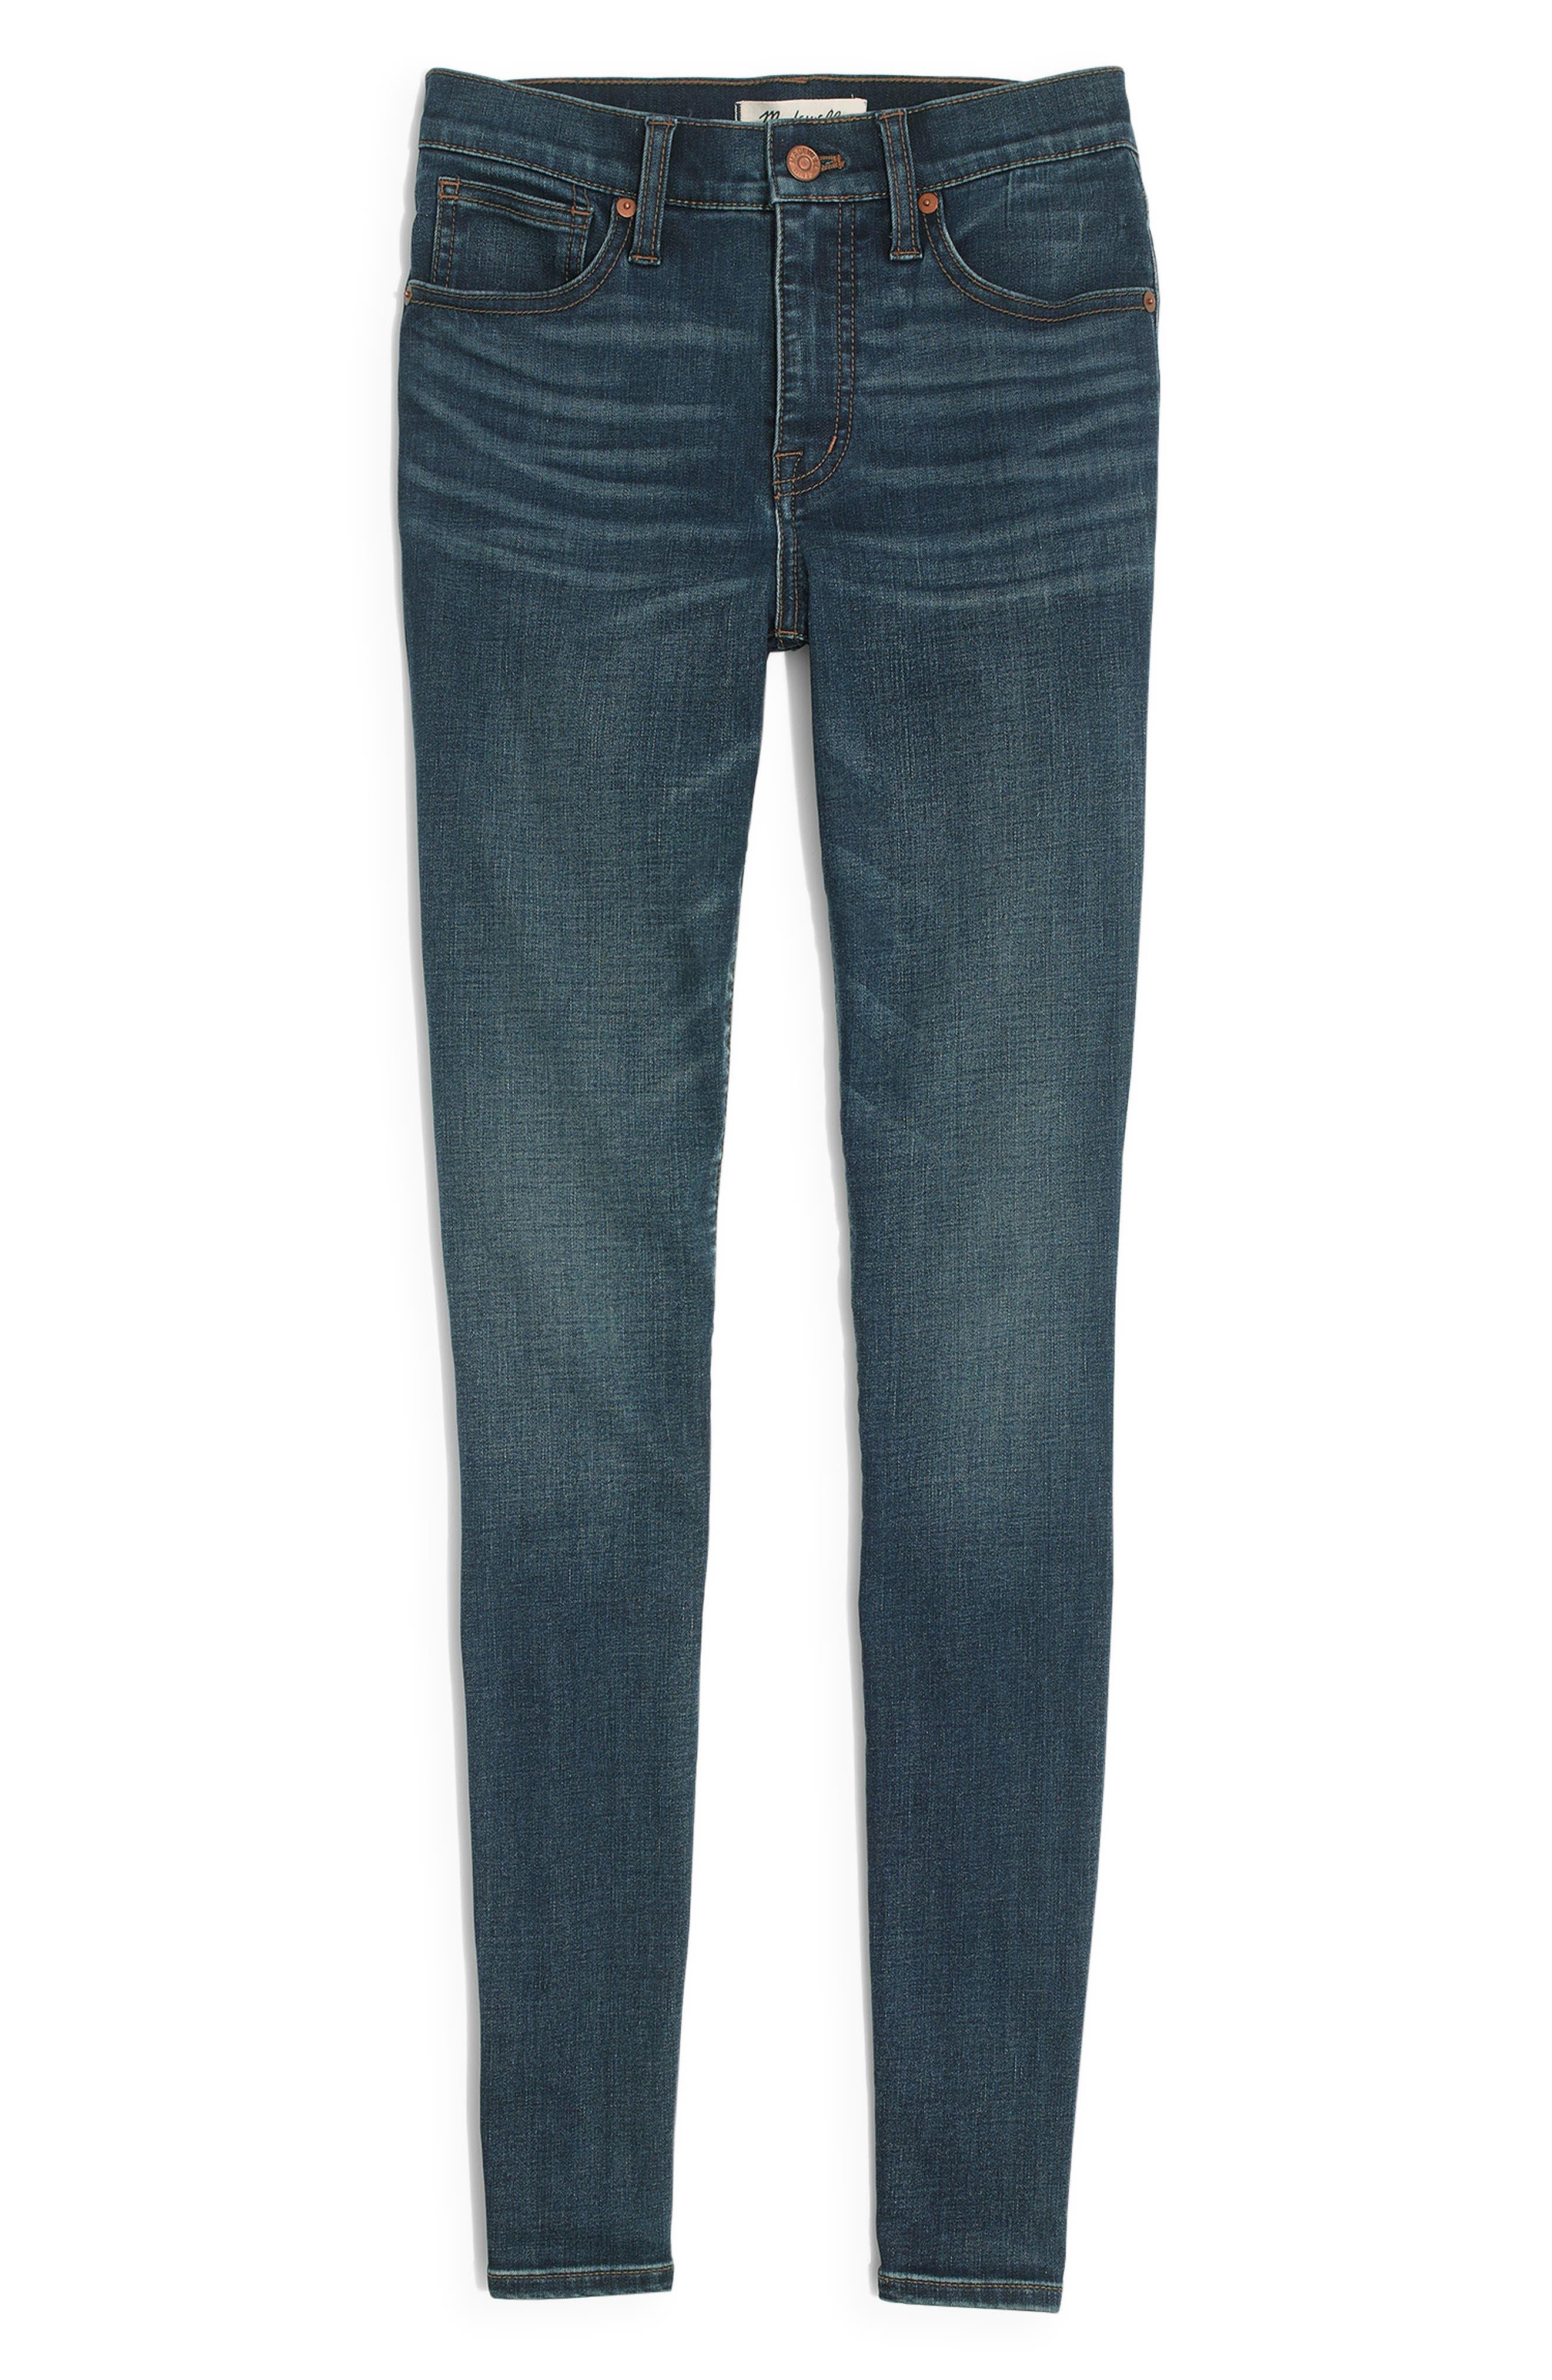 MADEWELL,                             10-Inch High Waist Skinny Jeans,                             Main thumbnail 1, color,                             TARREN